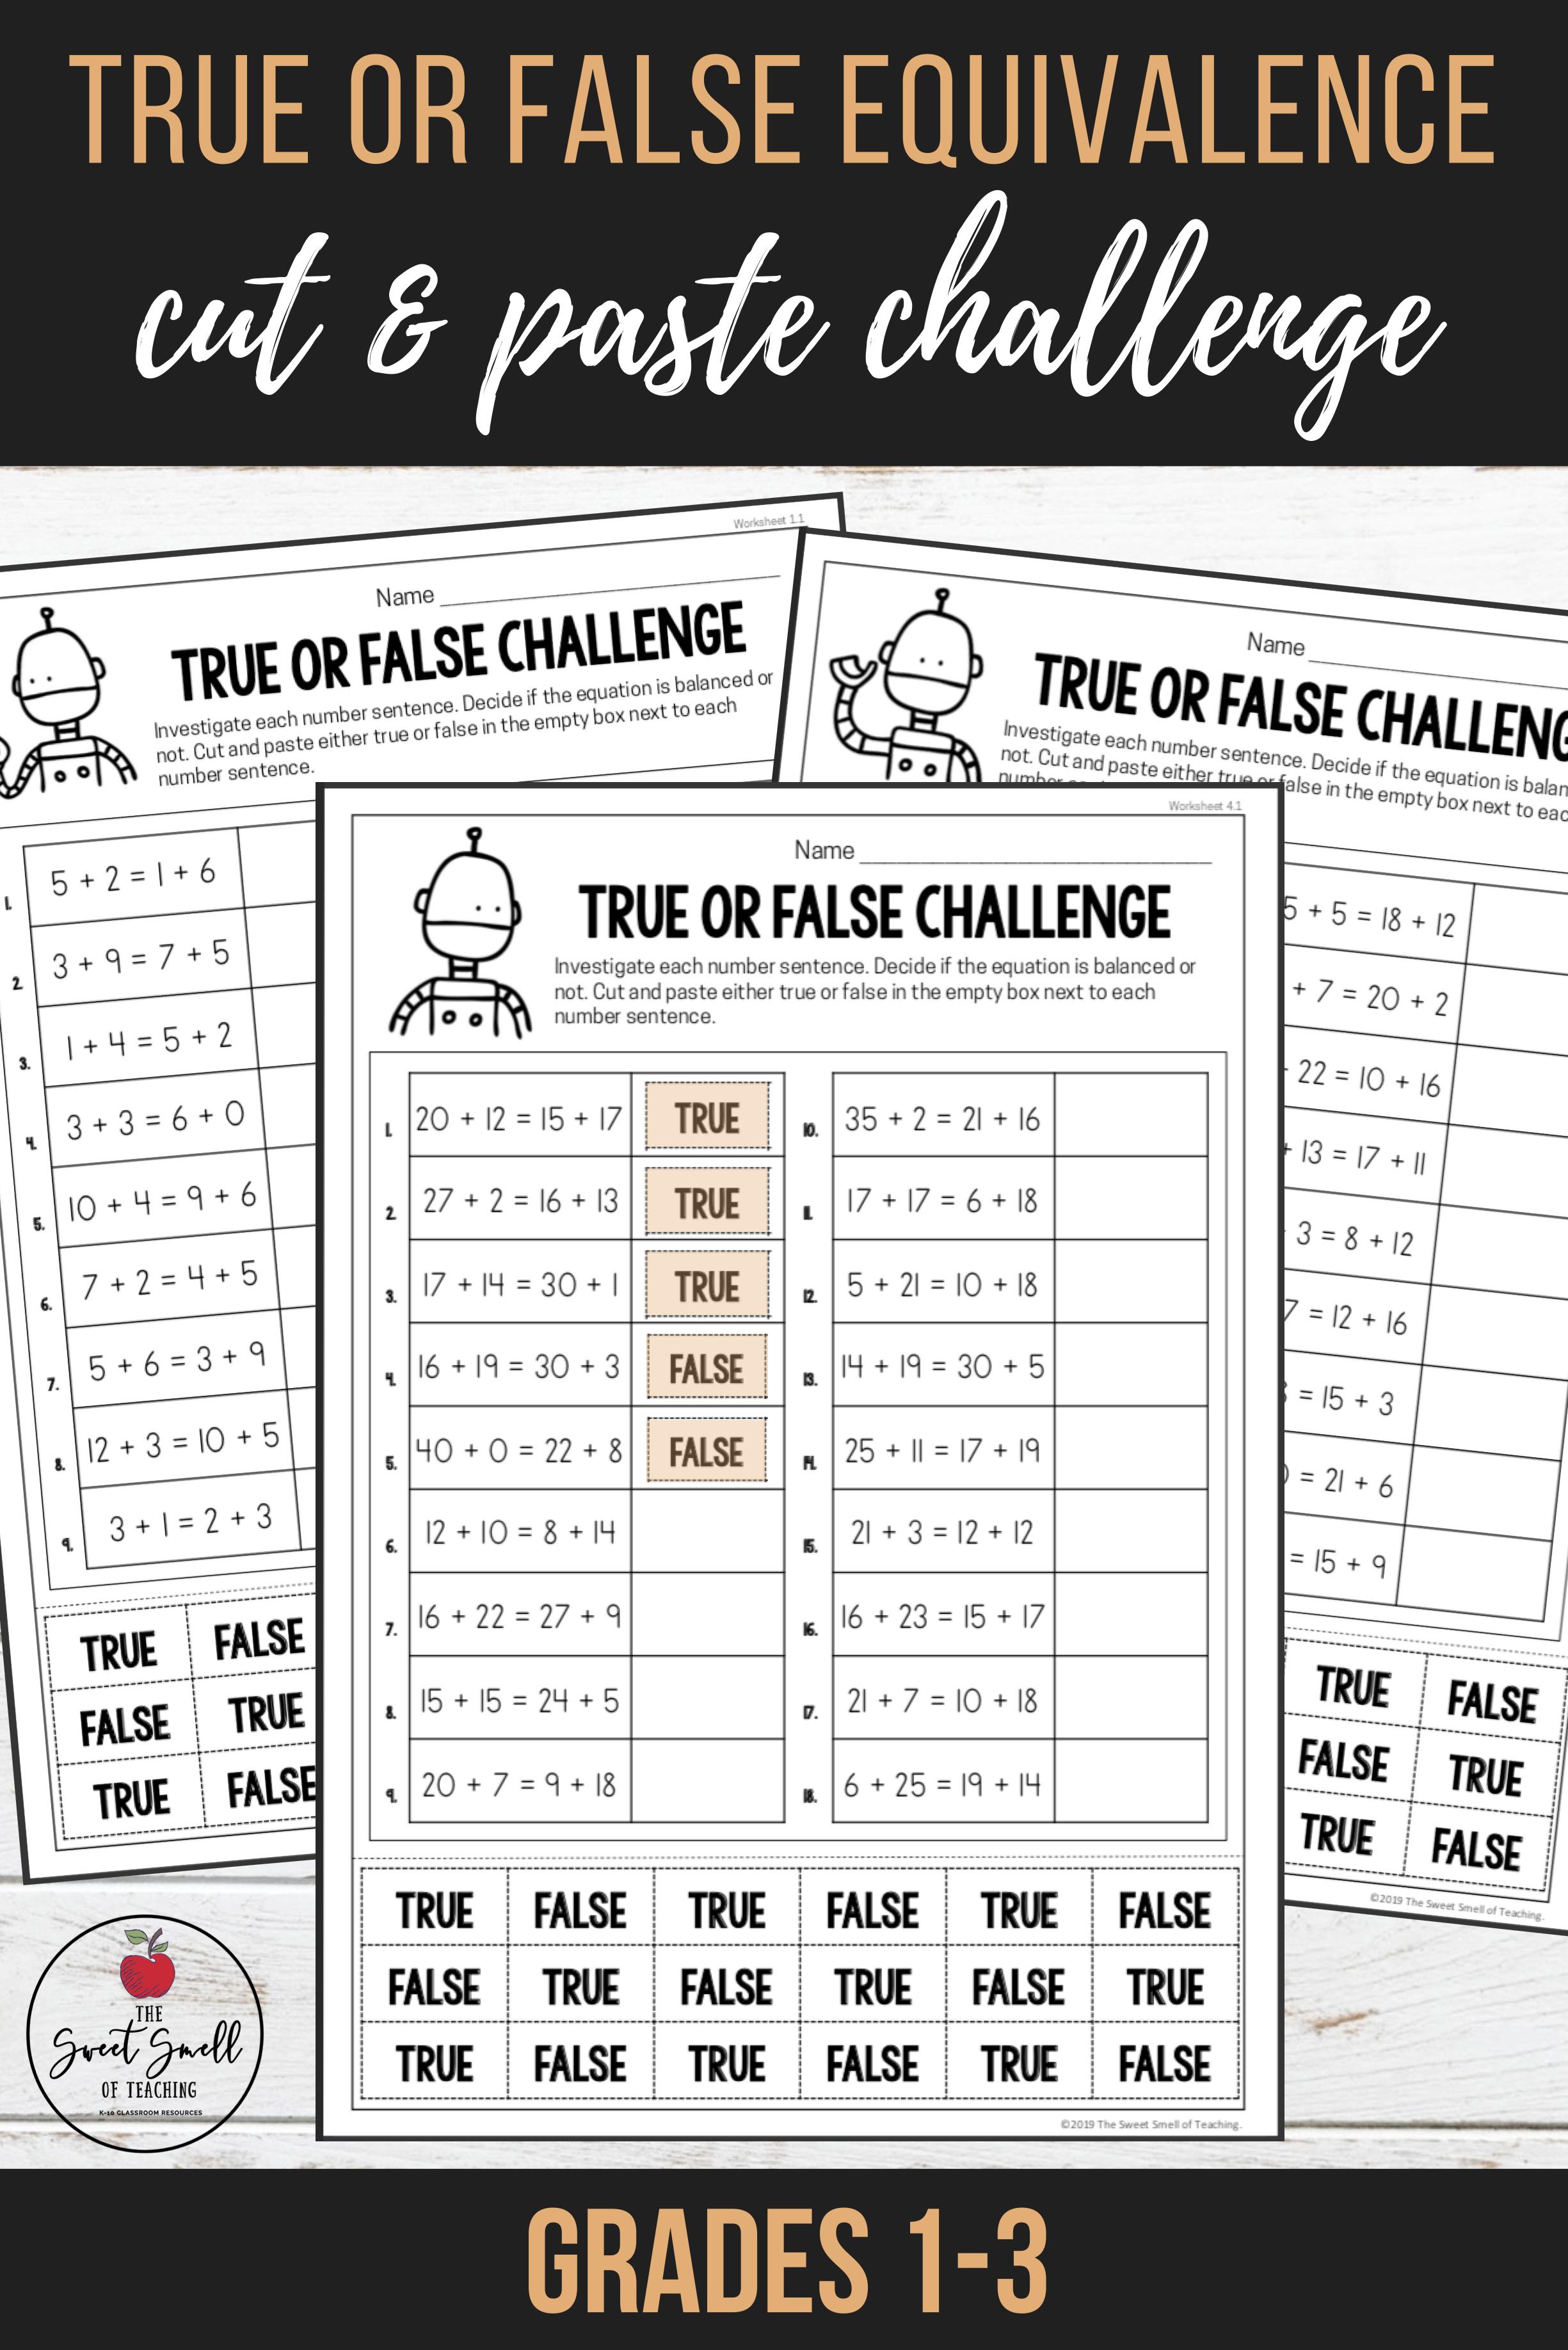 Balancing Equations - True Or False Equivalence Worksheets